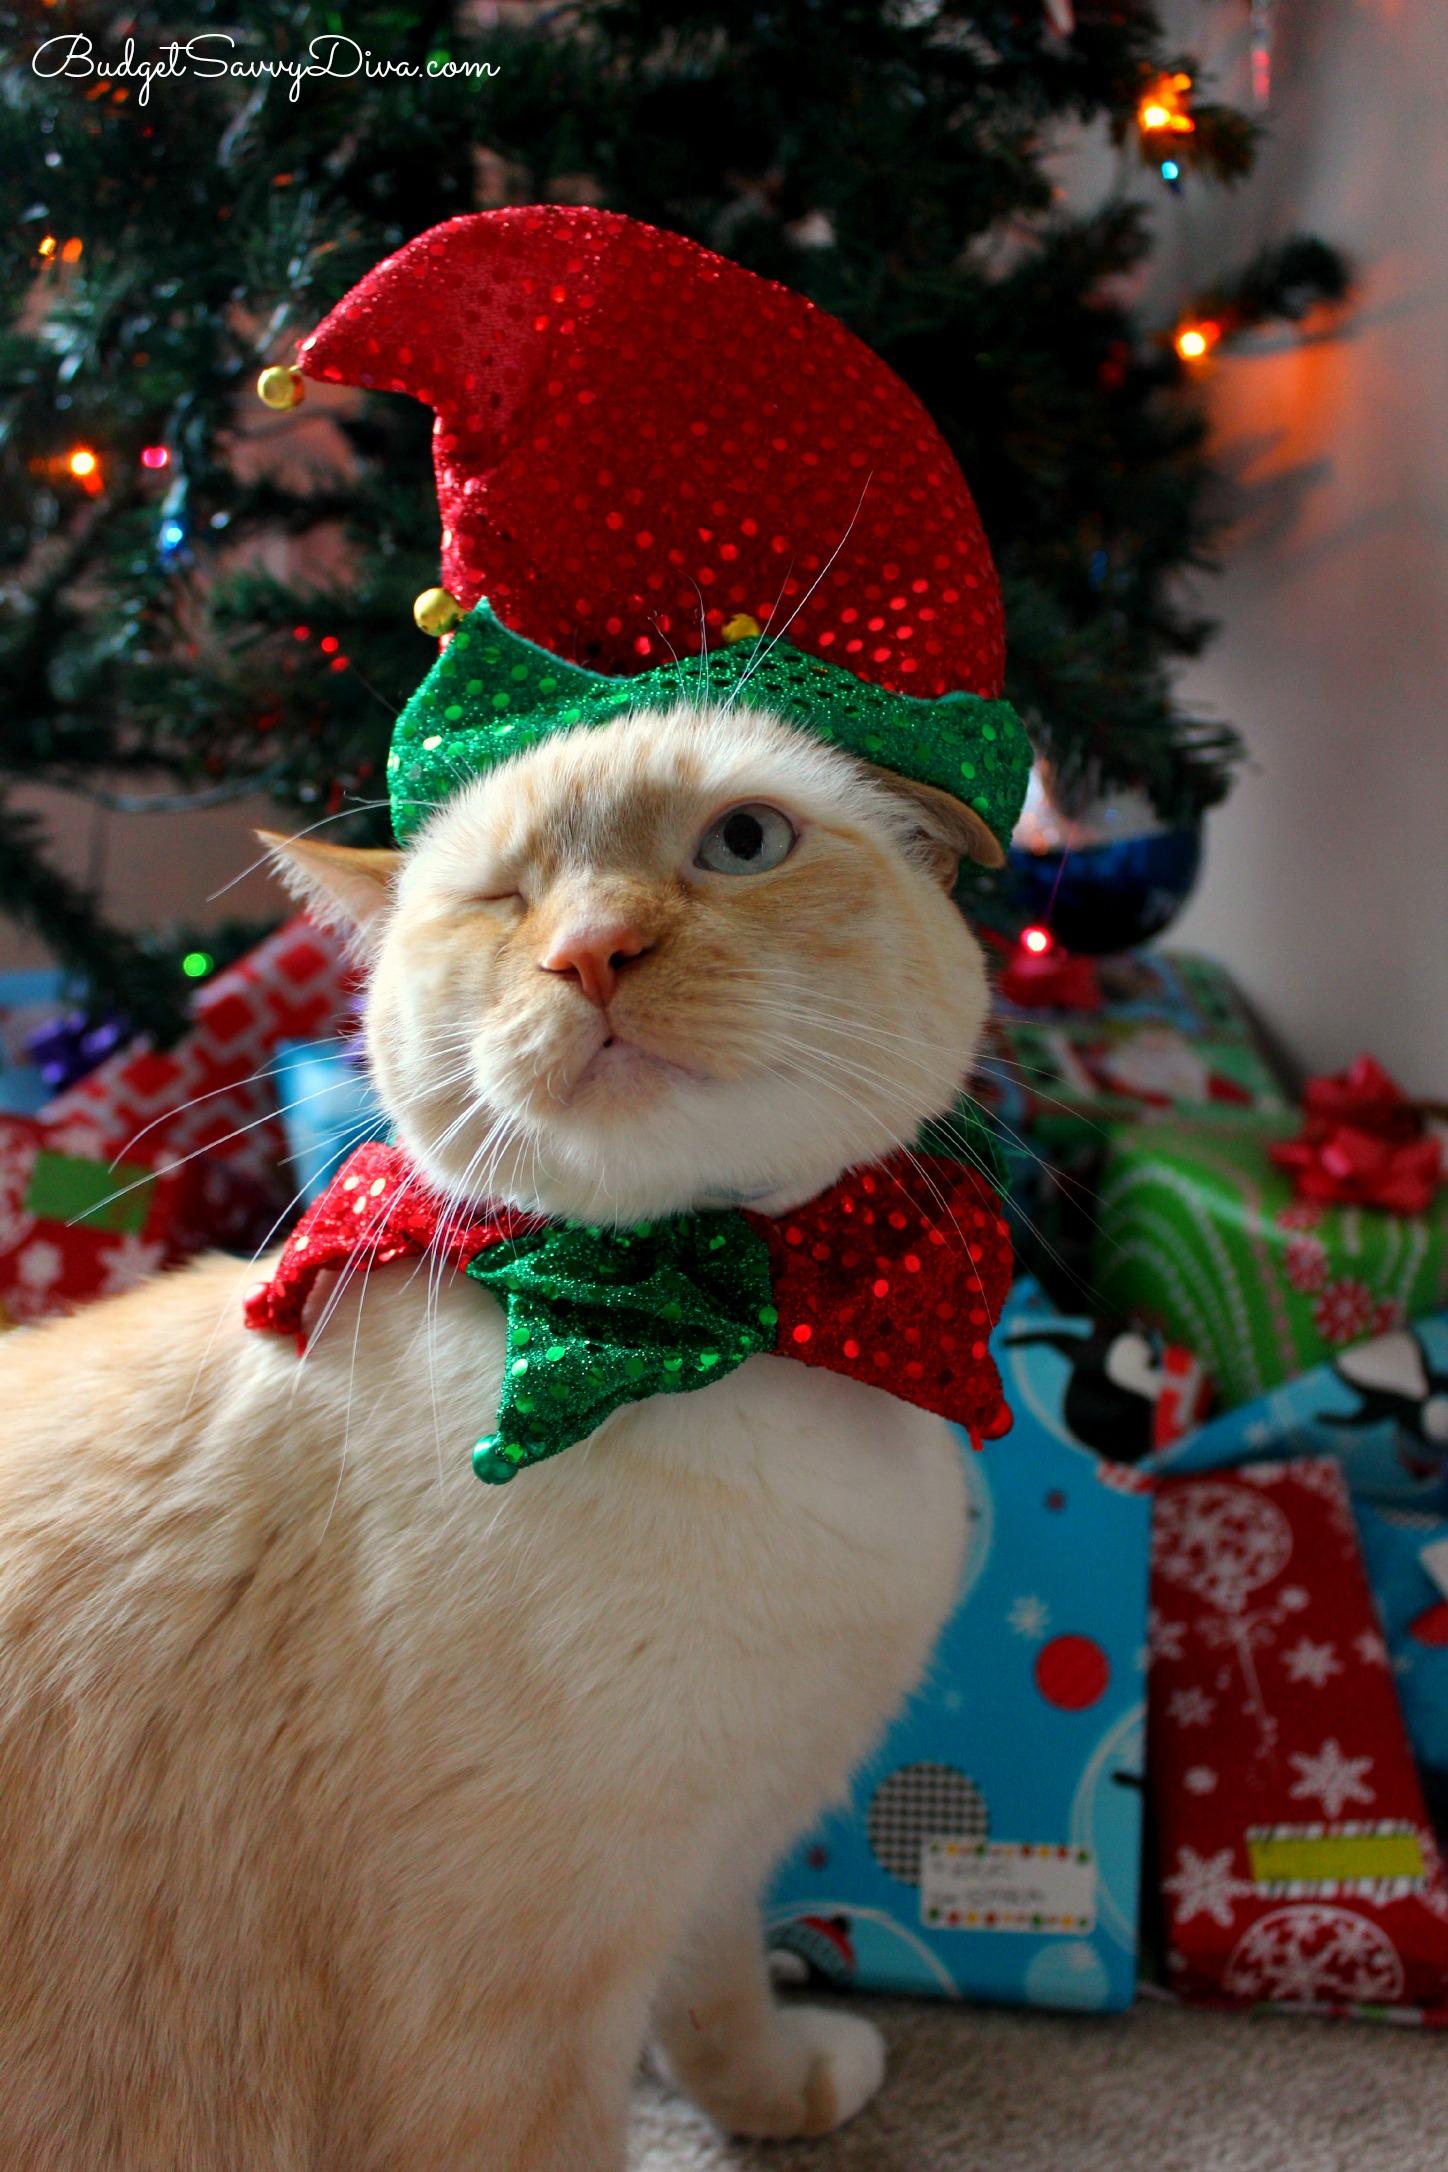 Petsmart Christmas Lookbook Budget Savvy Diva